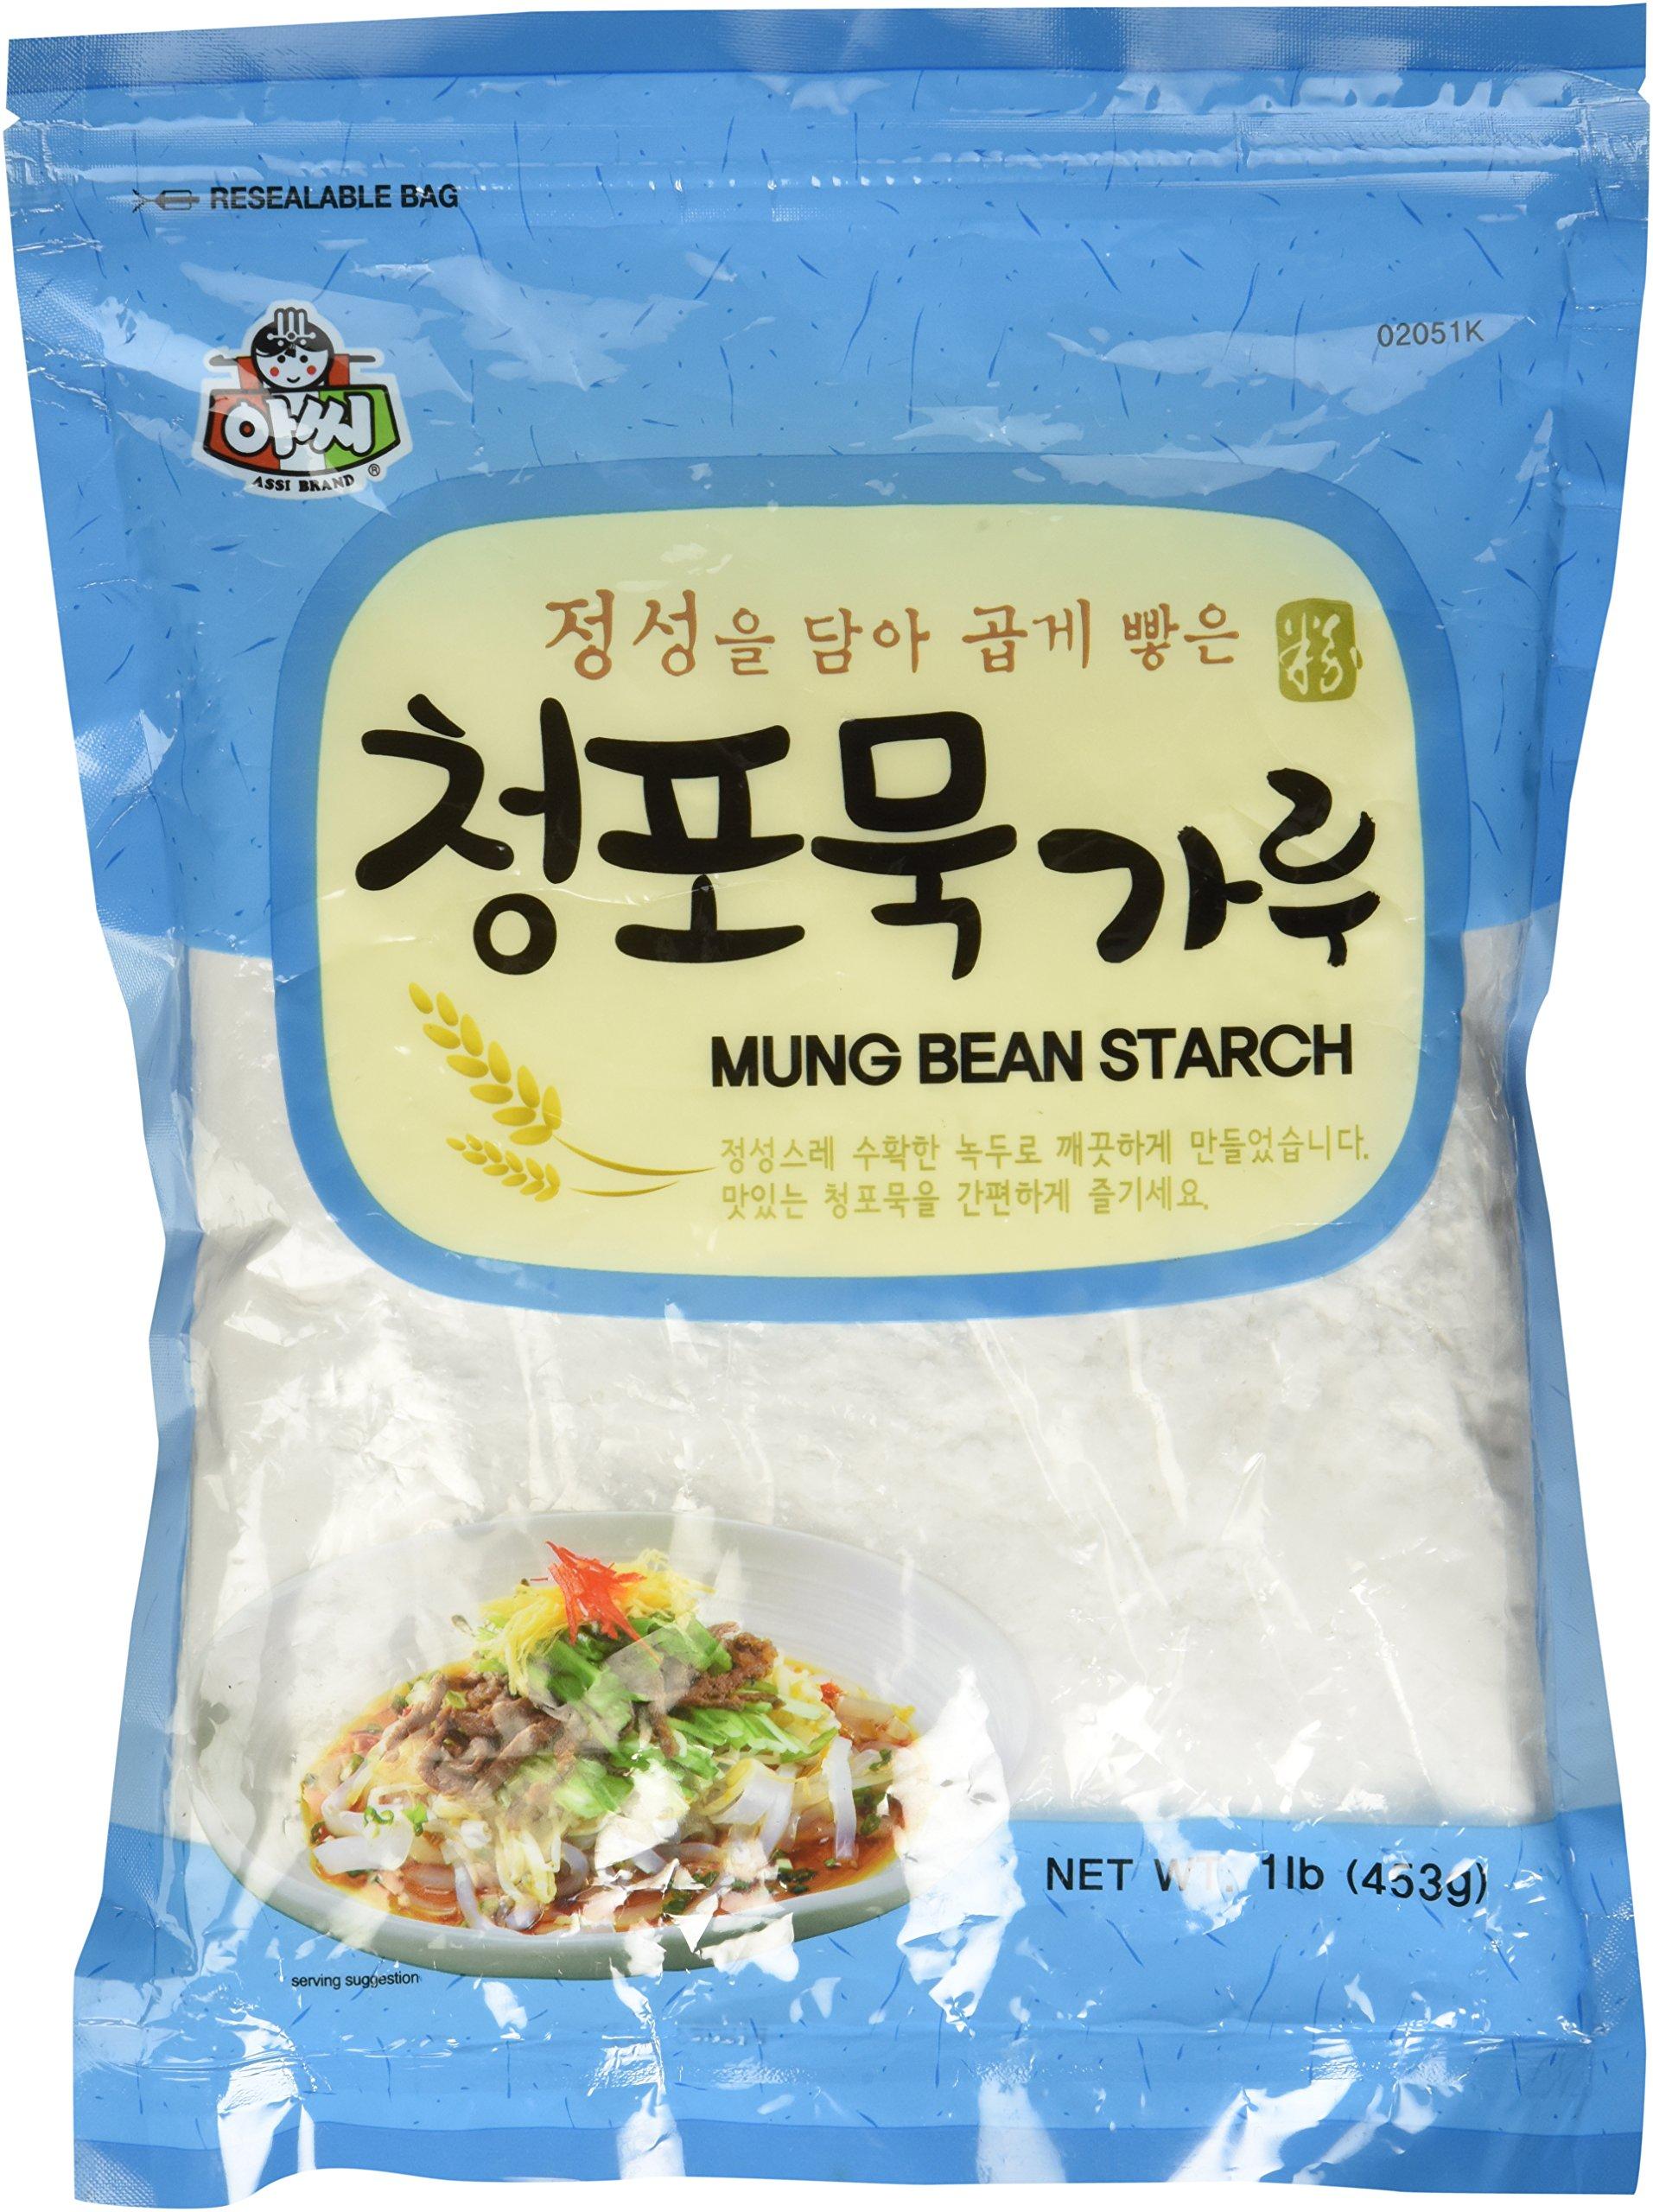 Amazon.com : Mung Bean Starch (Flour) 500g. : Wheat Flours